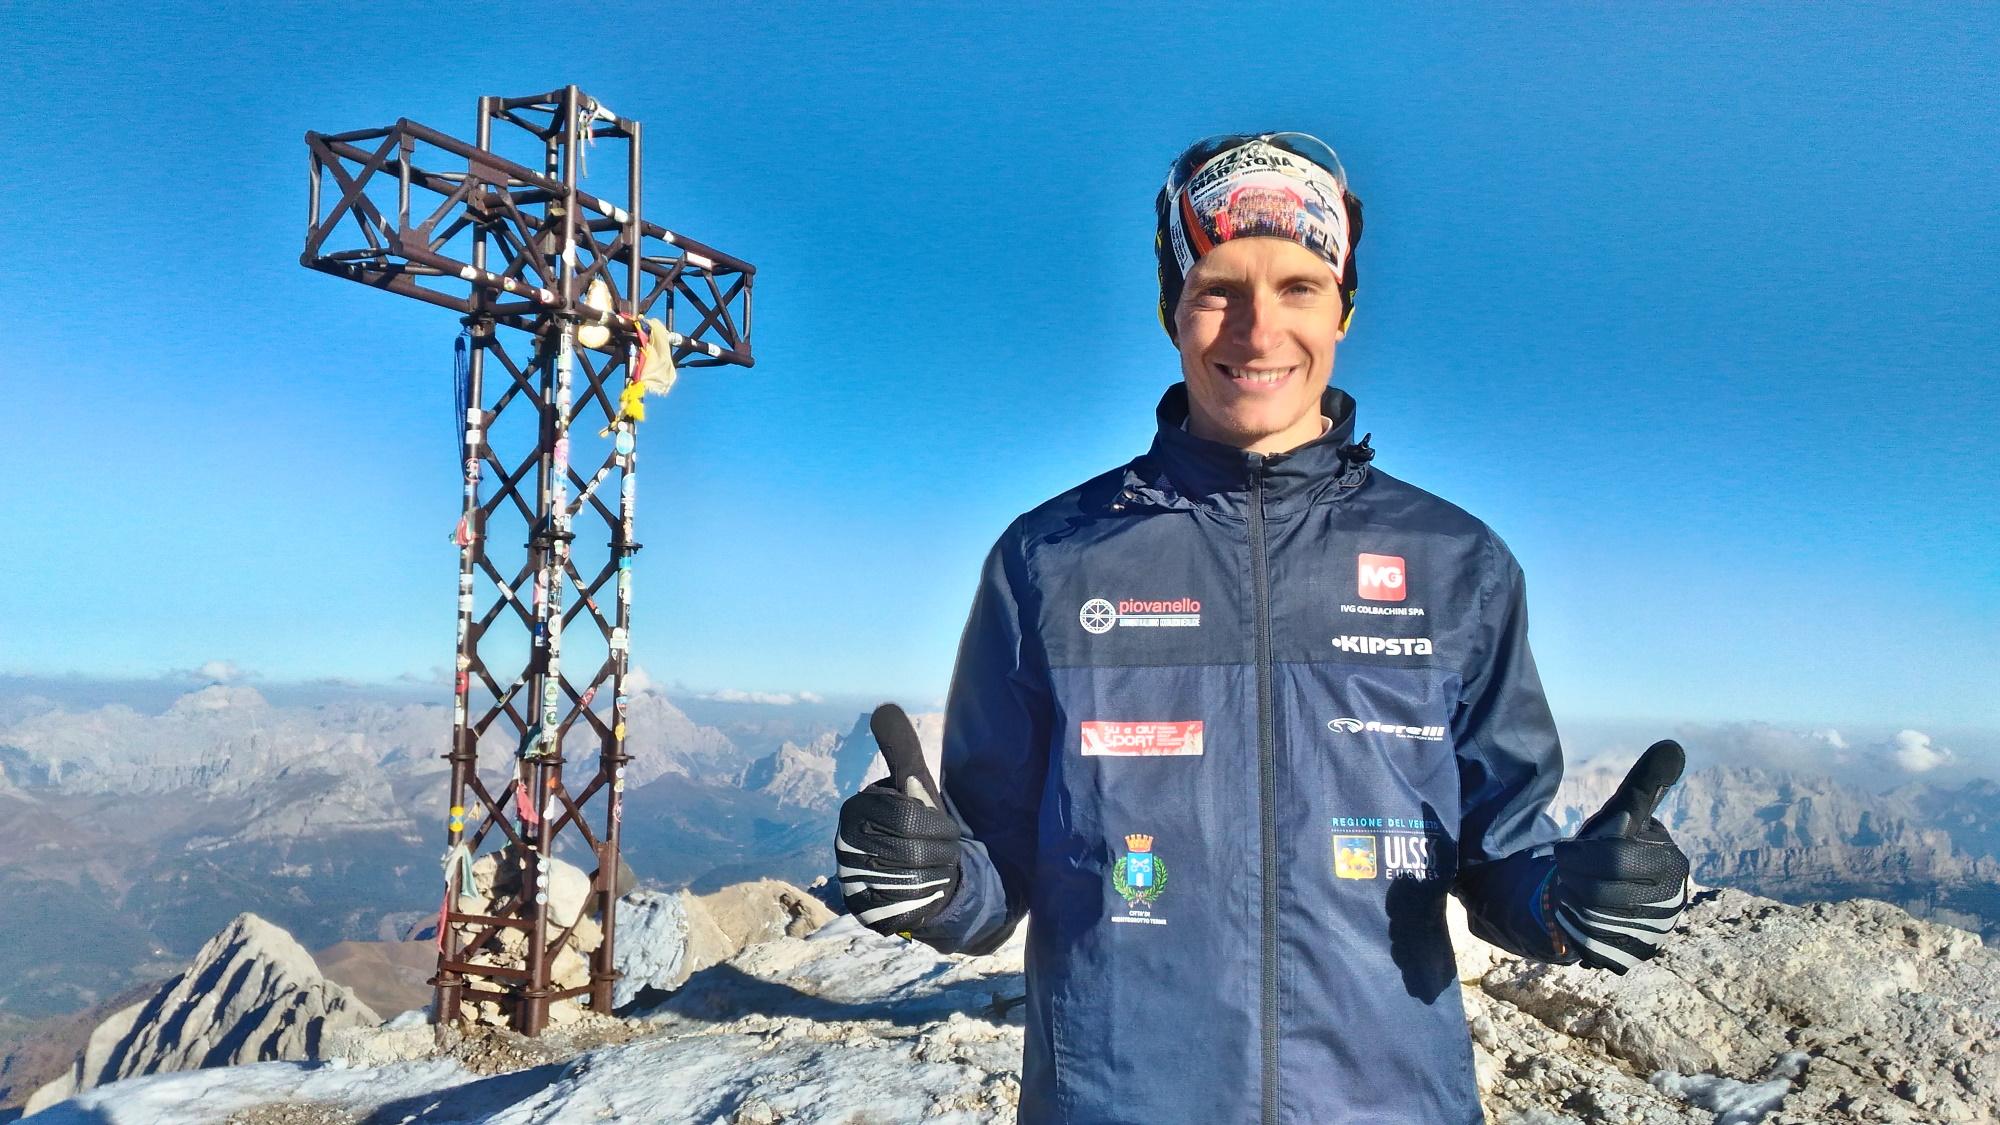 Stefano Benetton